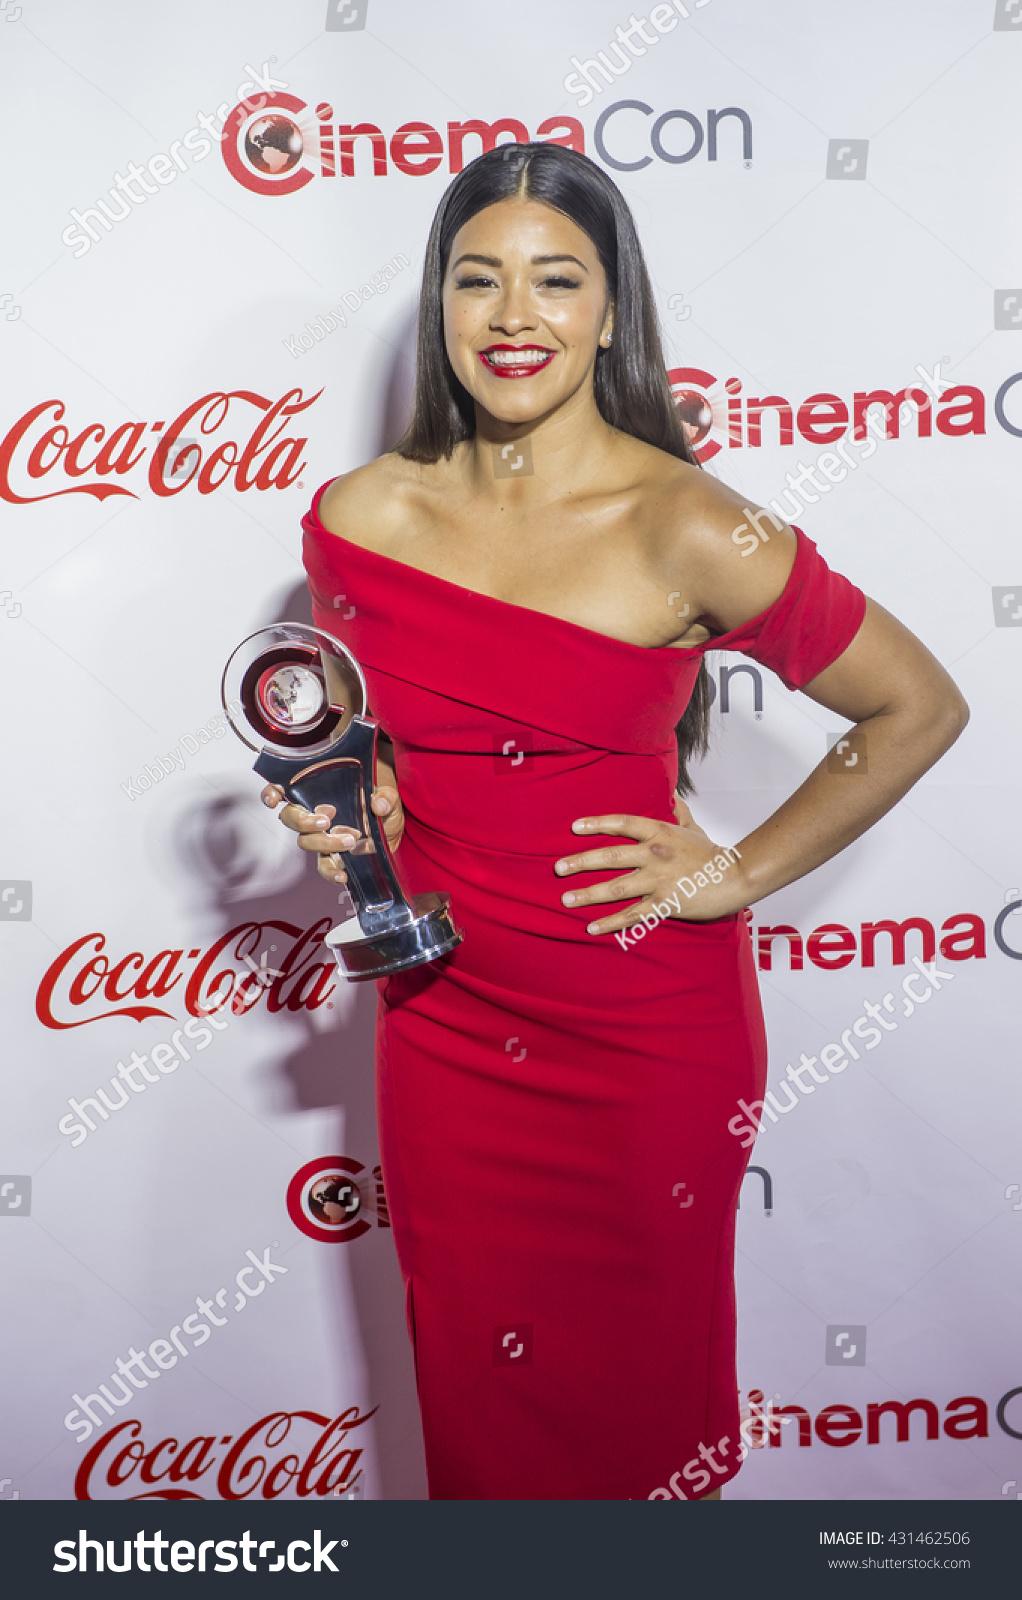 Porn Star Gina Rodriguez Complete las vegas april 14 actress gina stock photo 431462506 - shutterstock